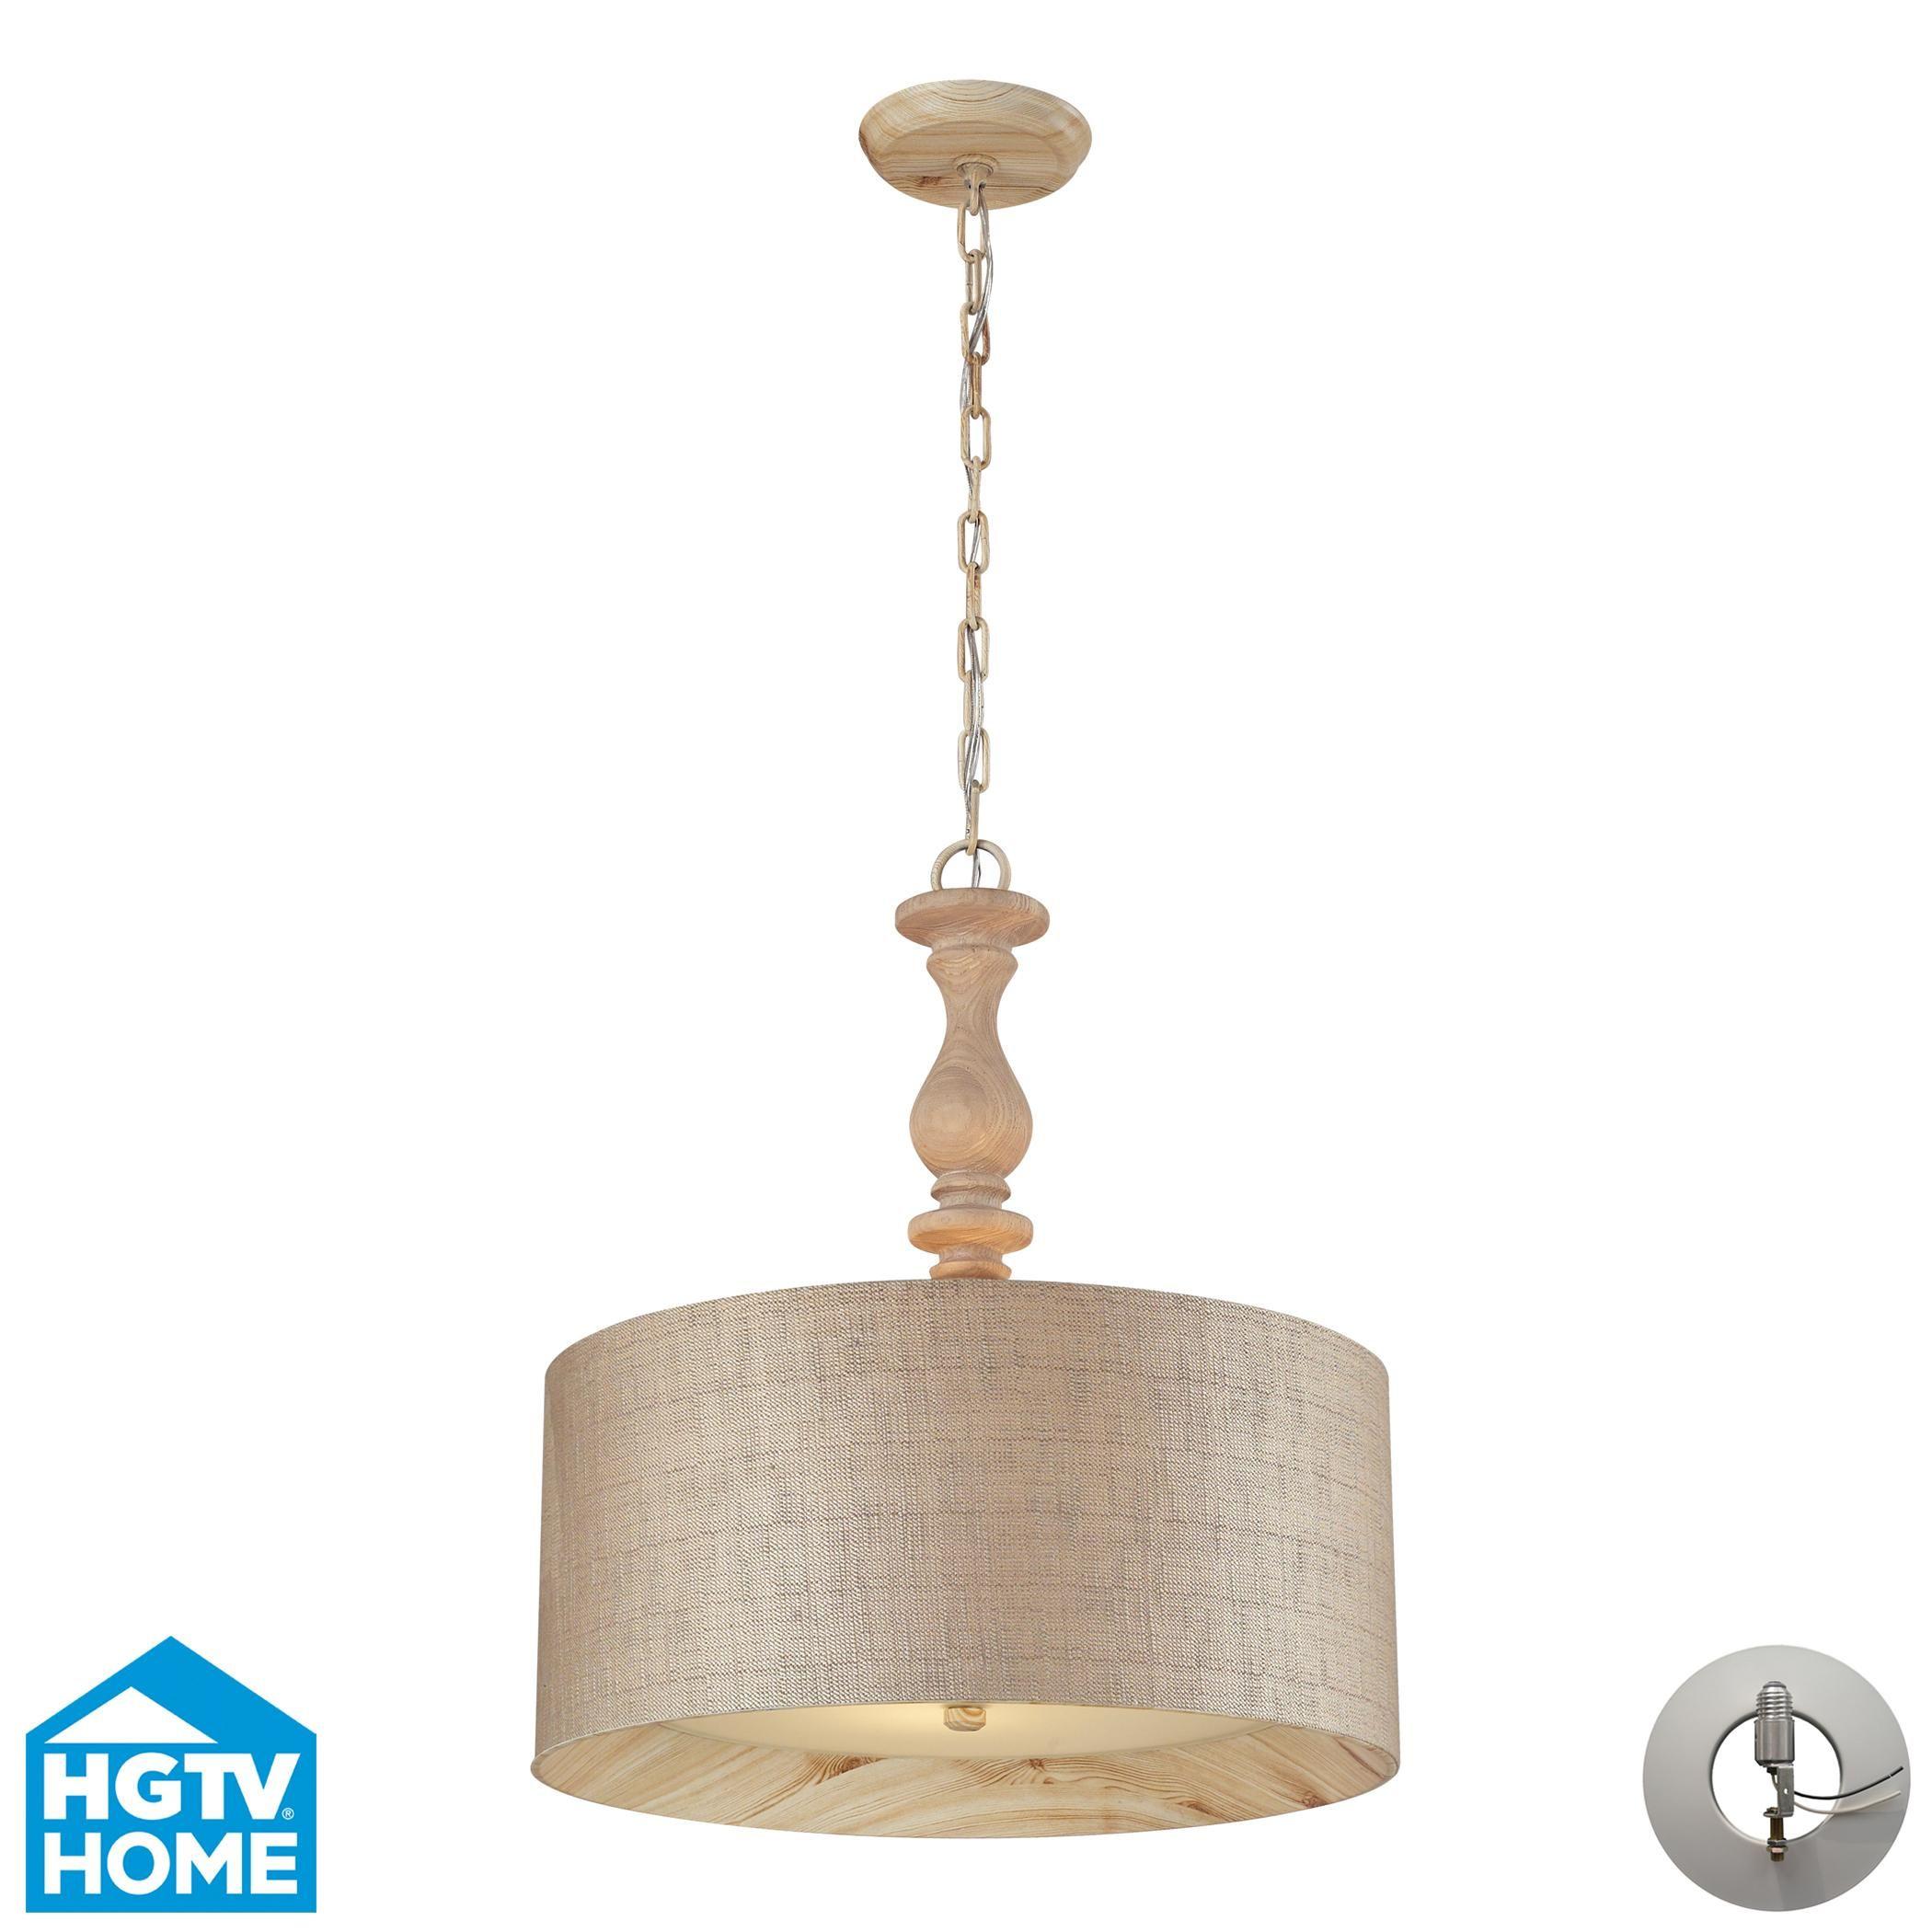 Elk lighting la nathan light pendant home accessories